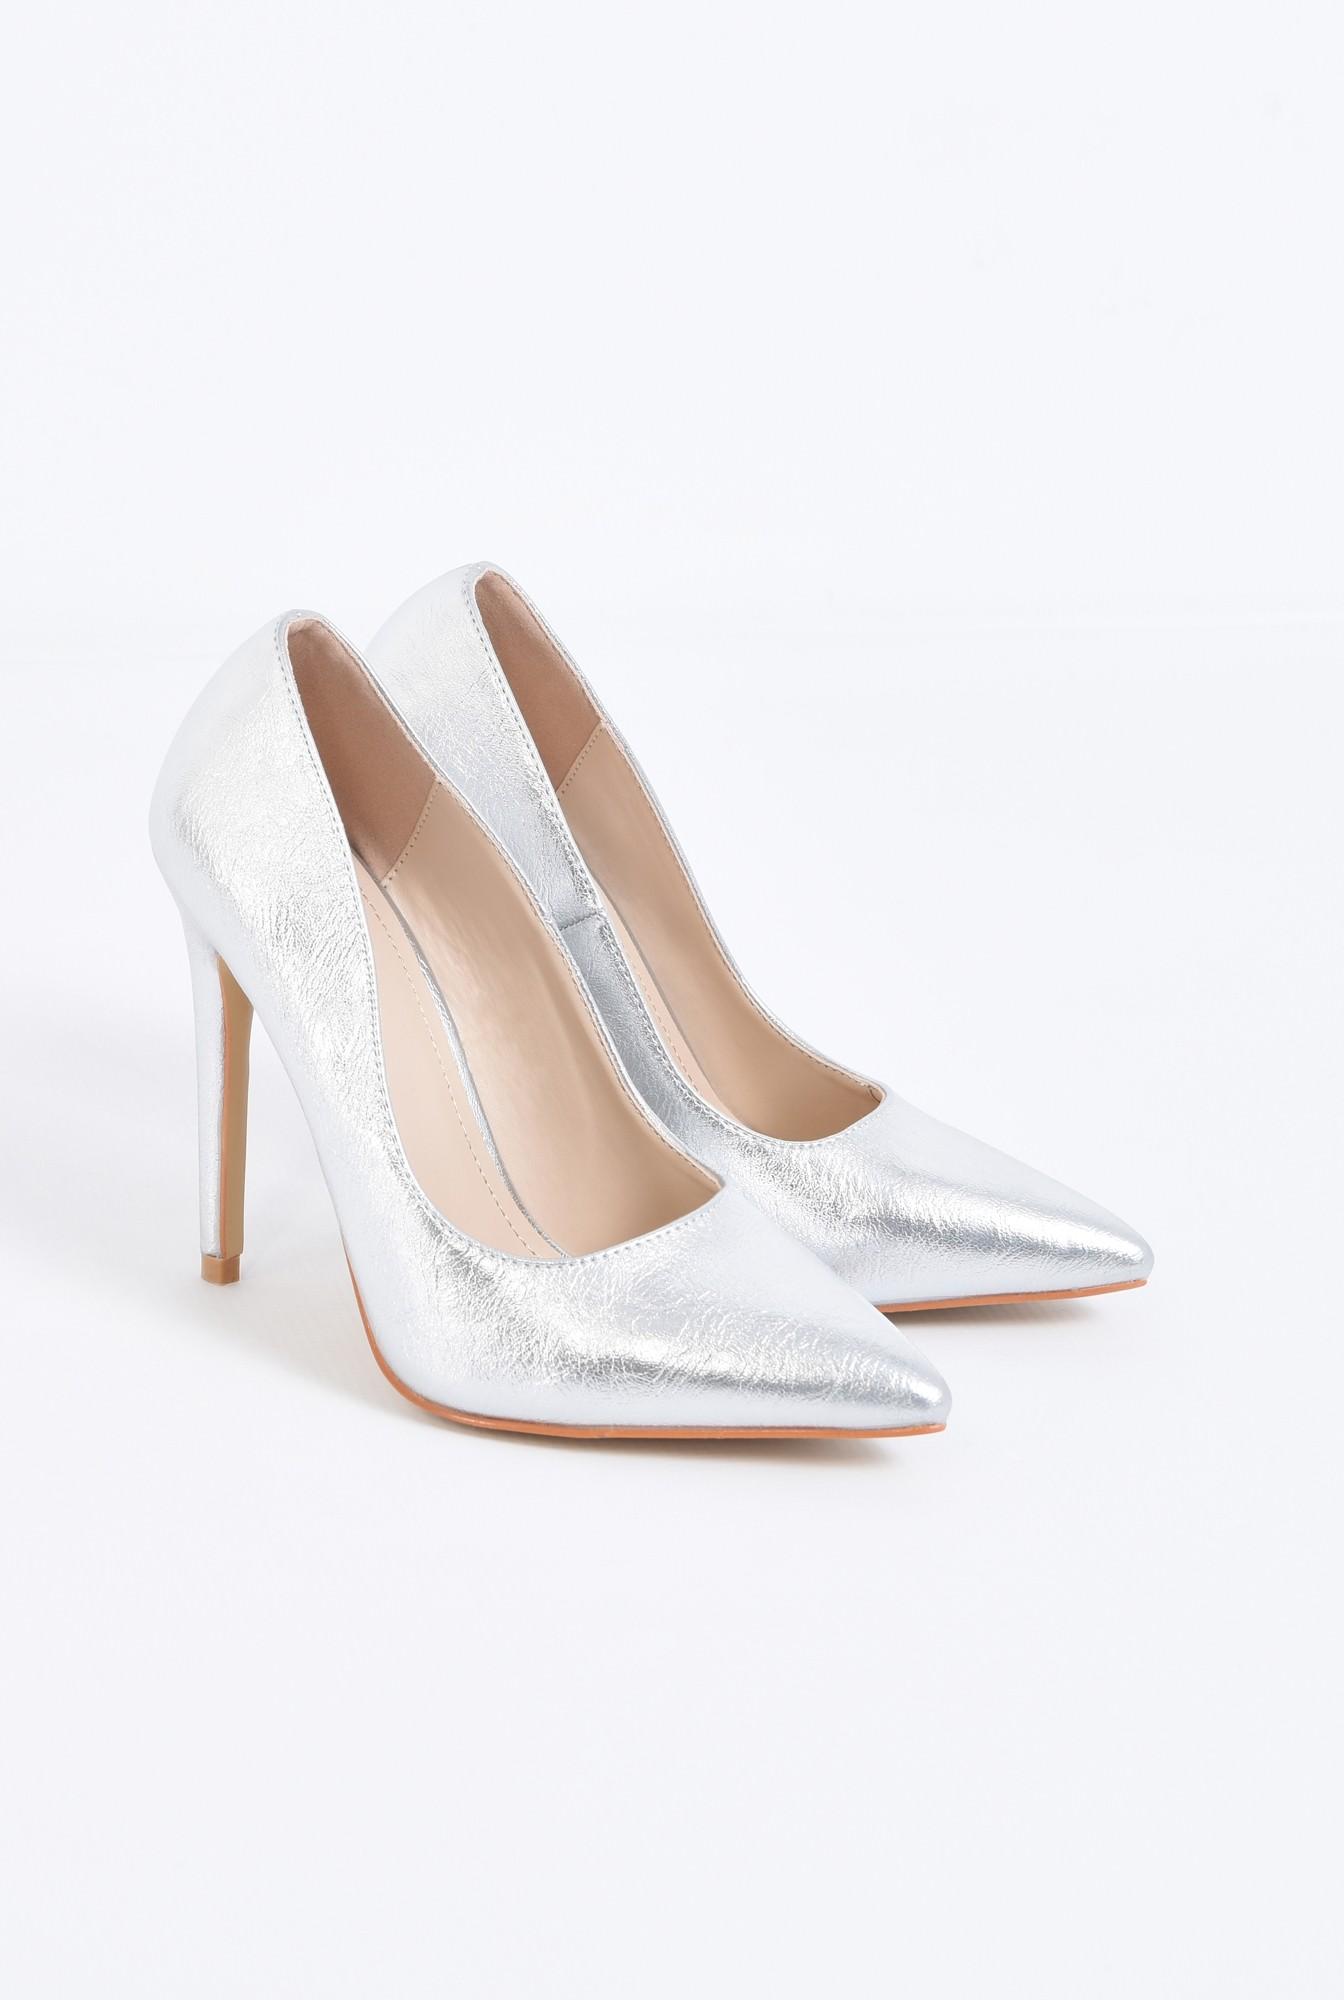 1 - pantofi dama, stiletto, argintiu, metalic